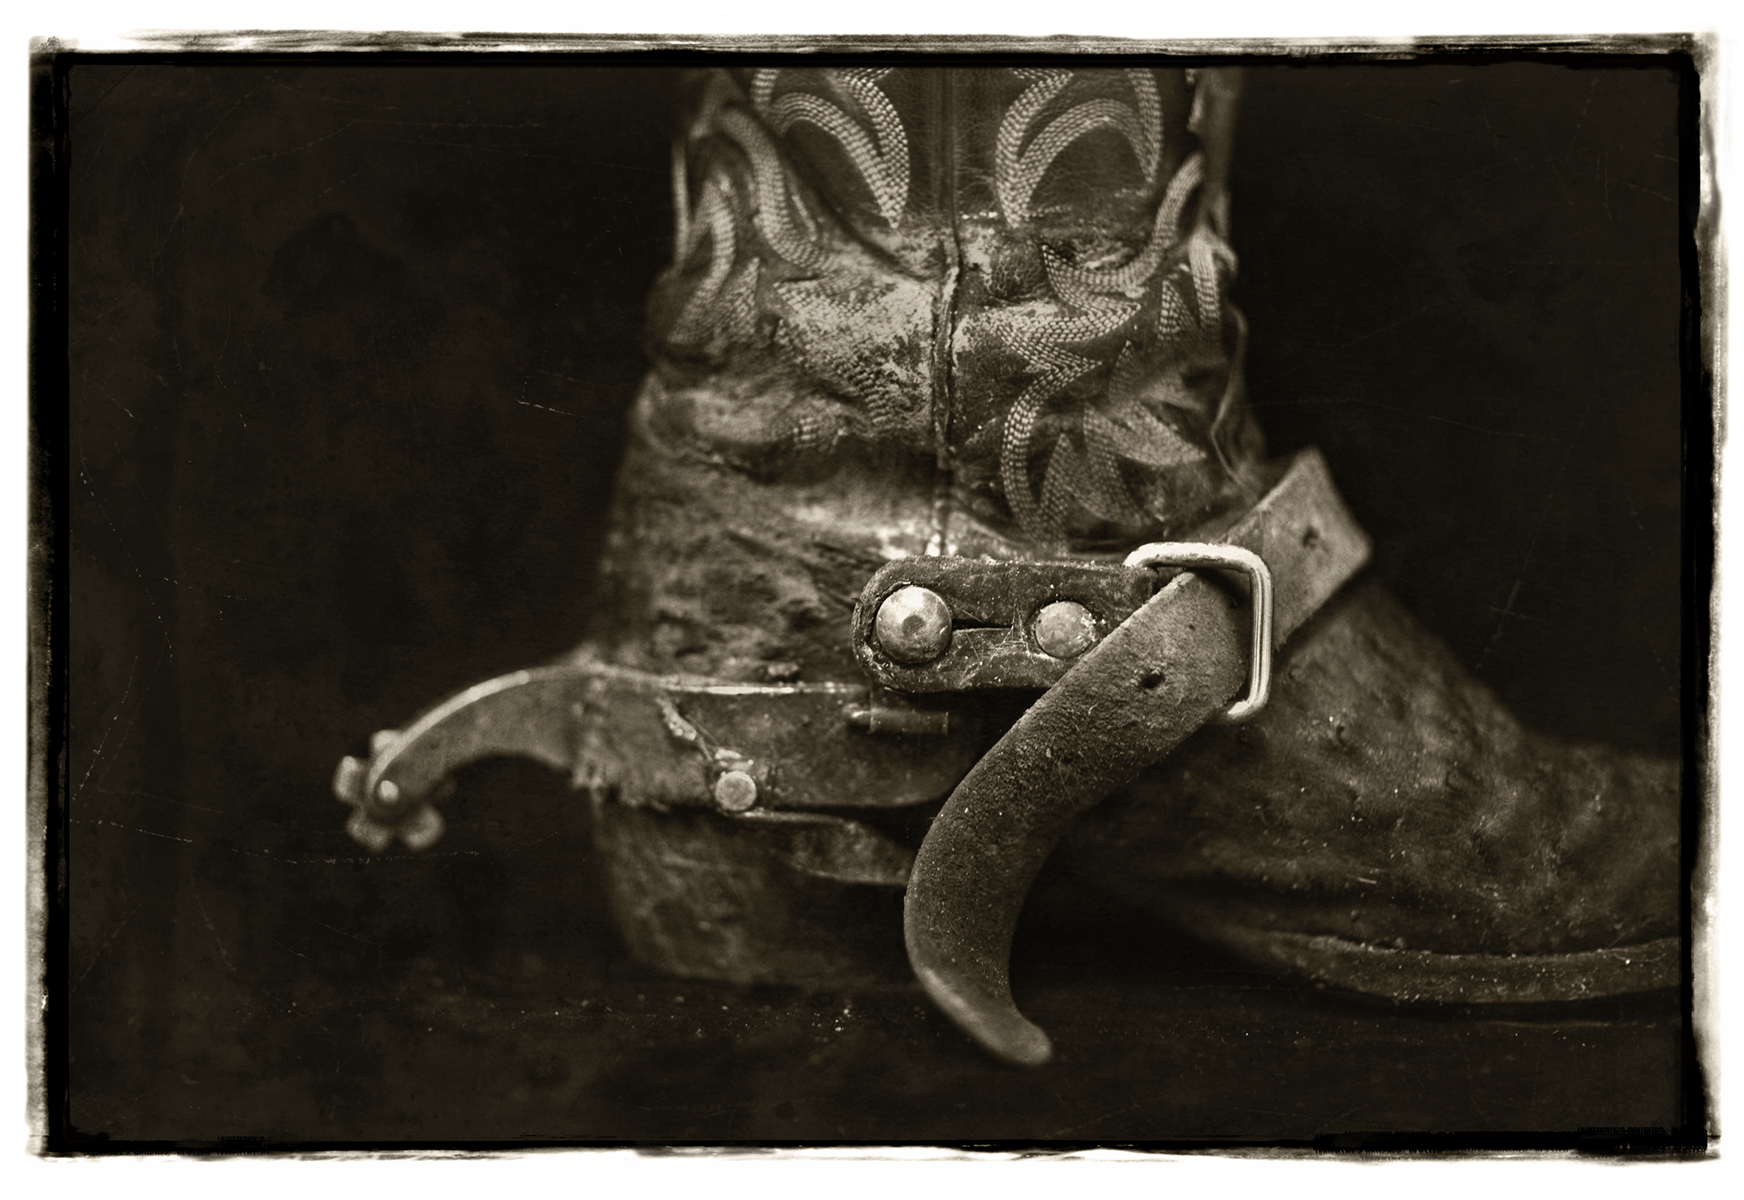 Richard Phibbs Photographer Interview